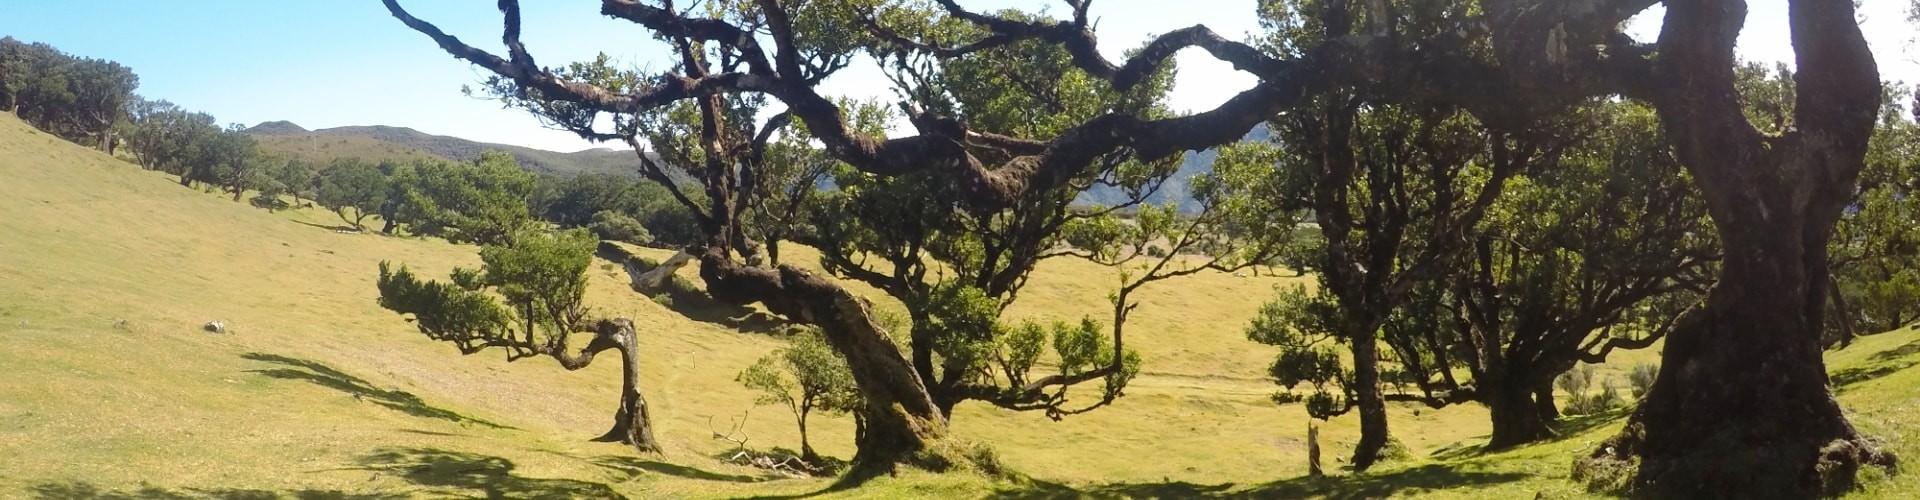 Madeira Island Nature